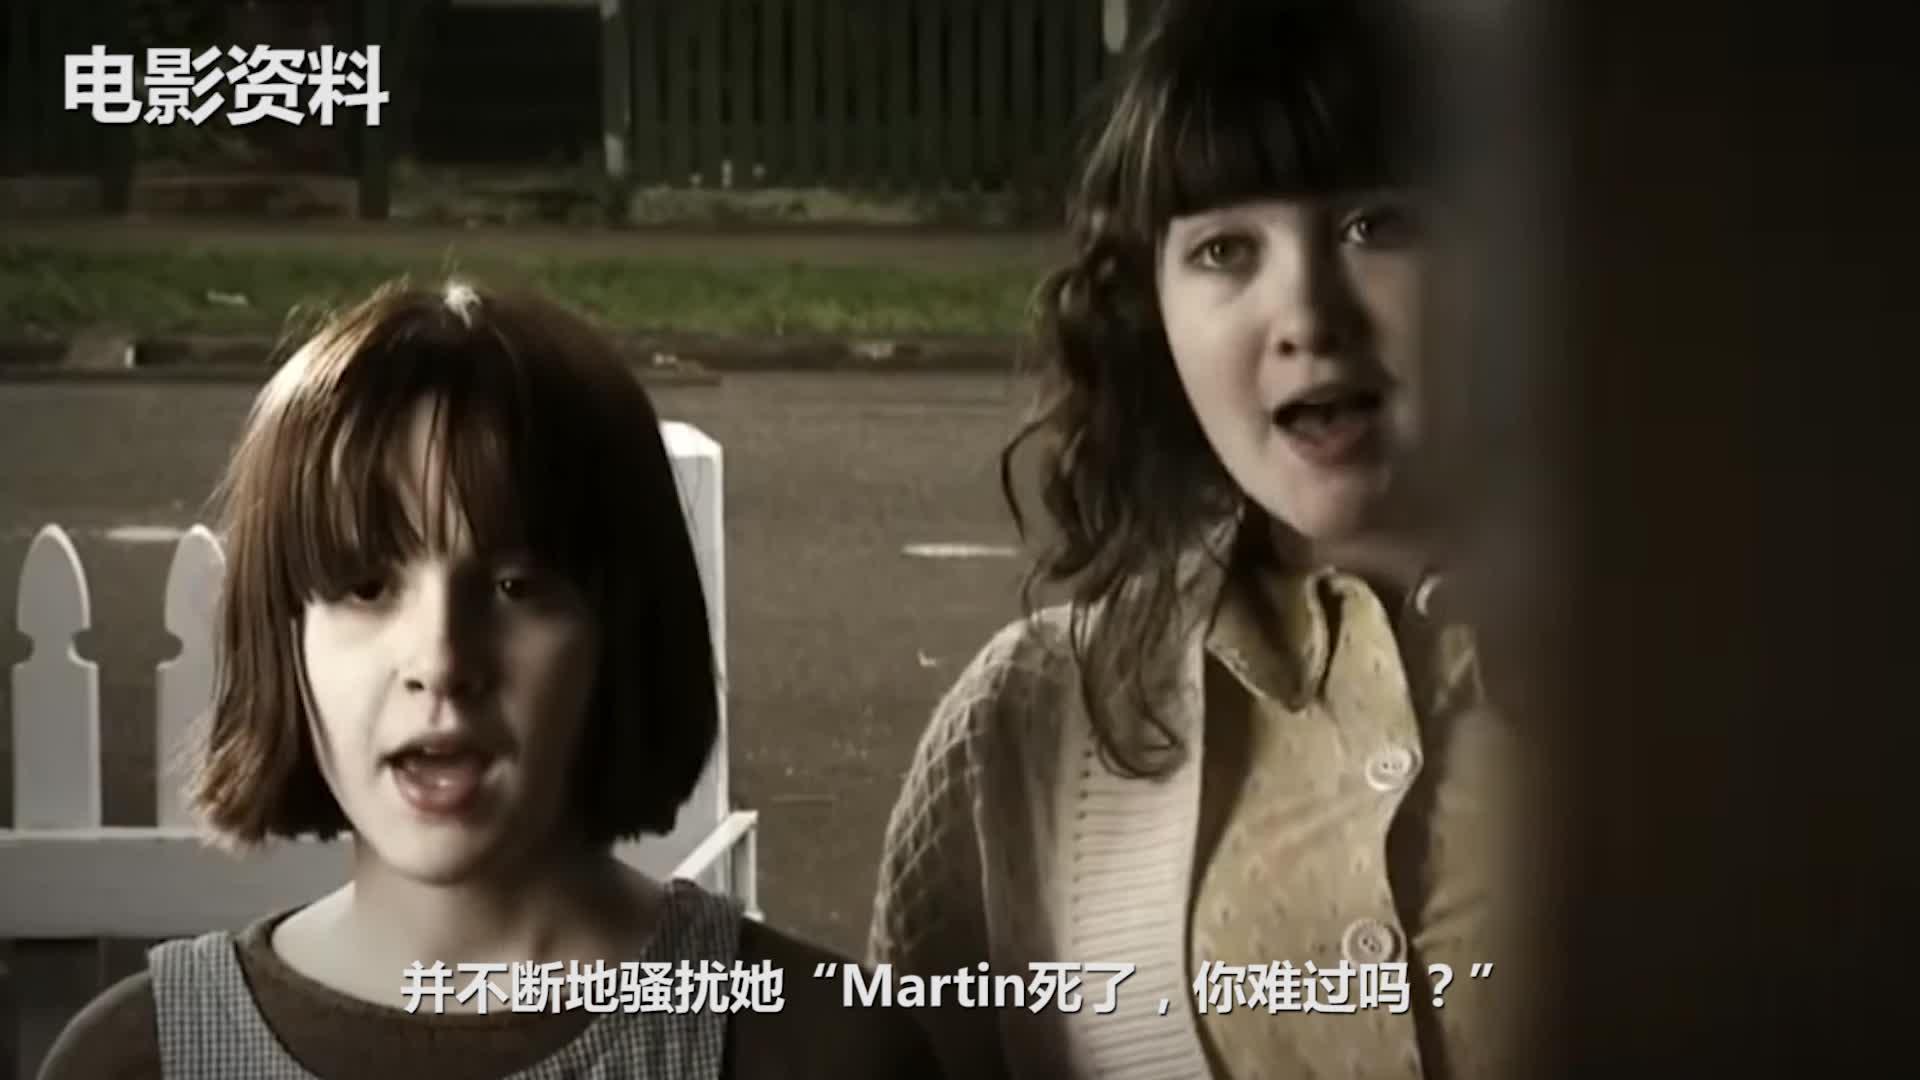 Big笑工坊-唐唐说奇案:英国十岁女杀人犯,出狱后写自传成富翁!